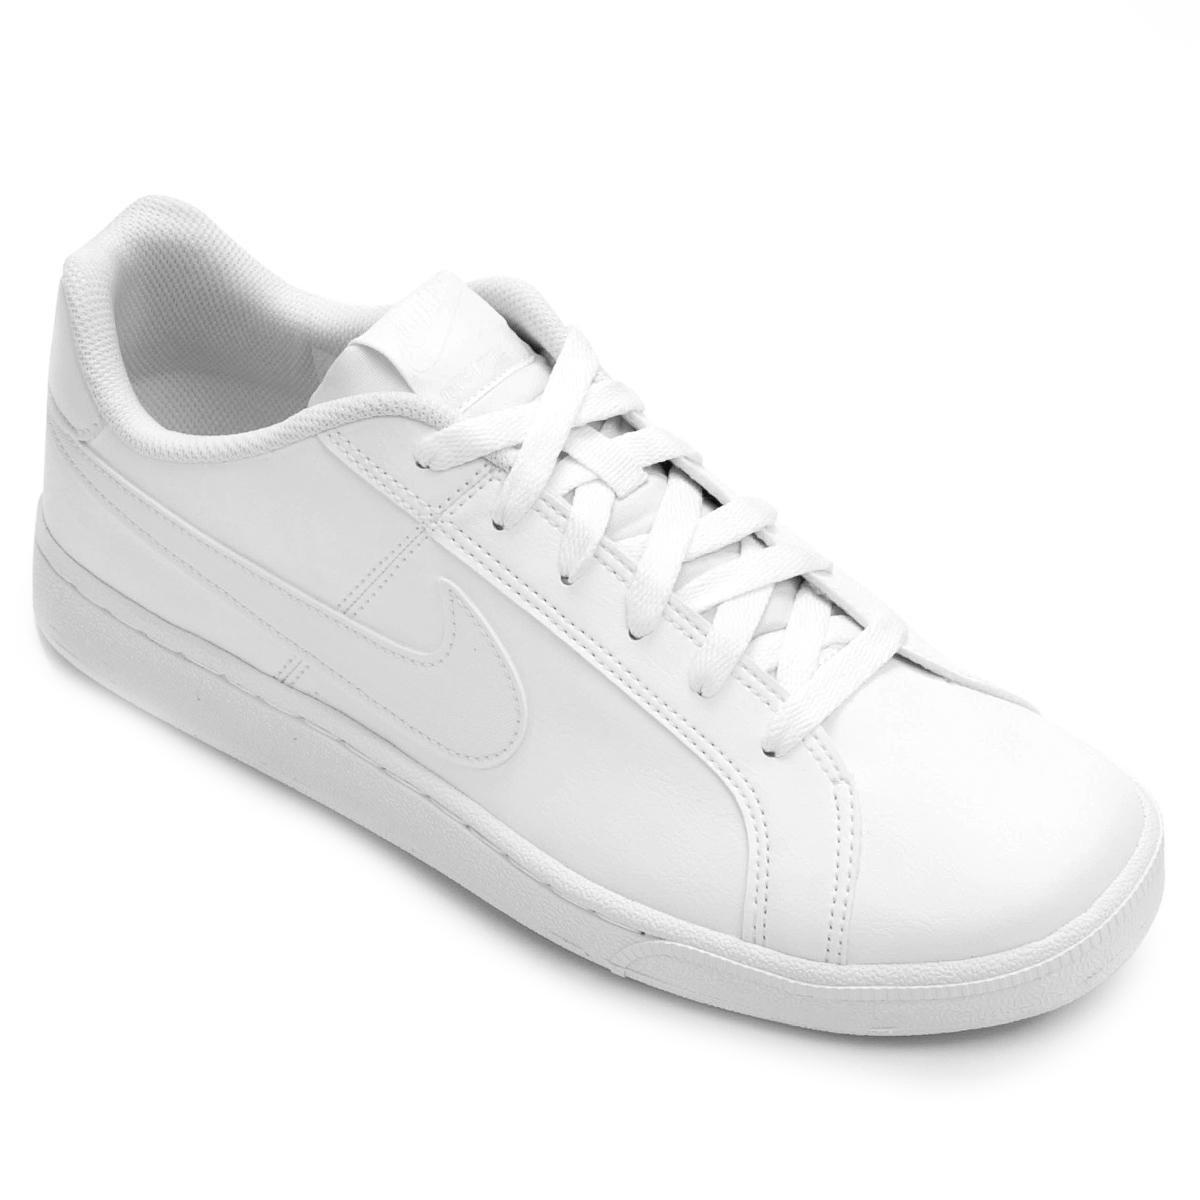 Tênis Tênis Court Couro Nike Royale Royale Nike Masculino Couro Branco Court wqI1Oq